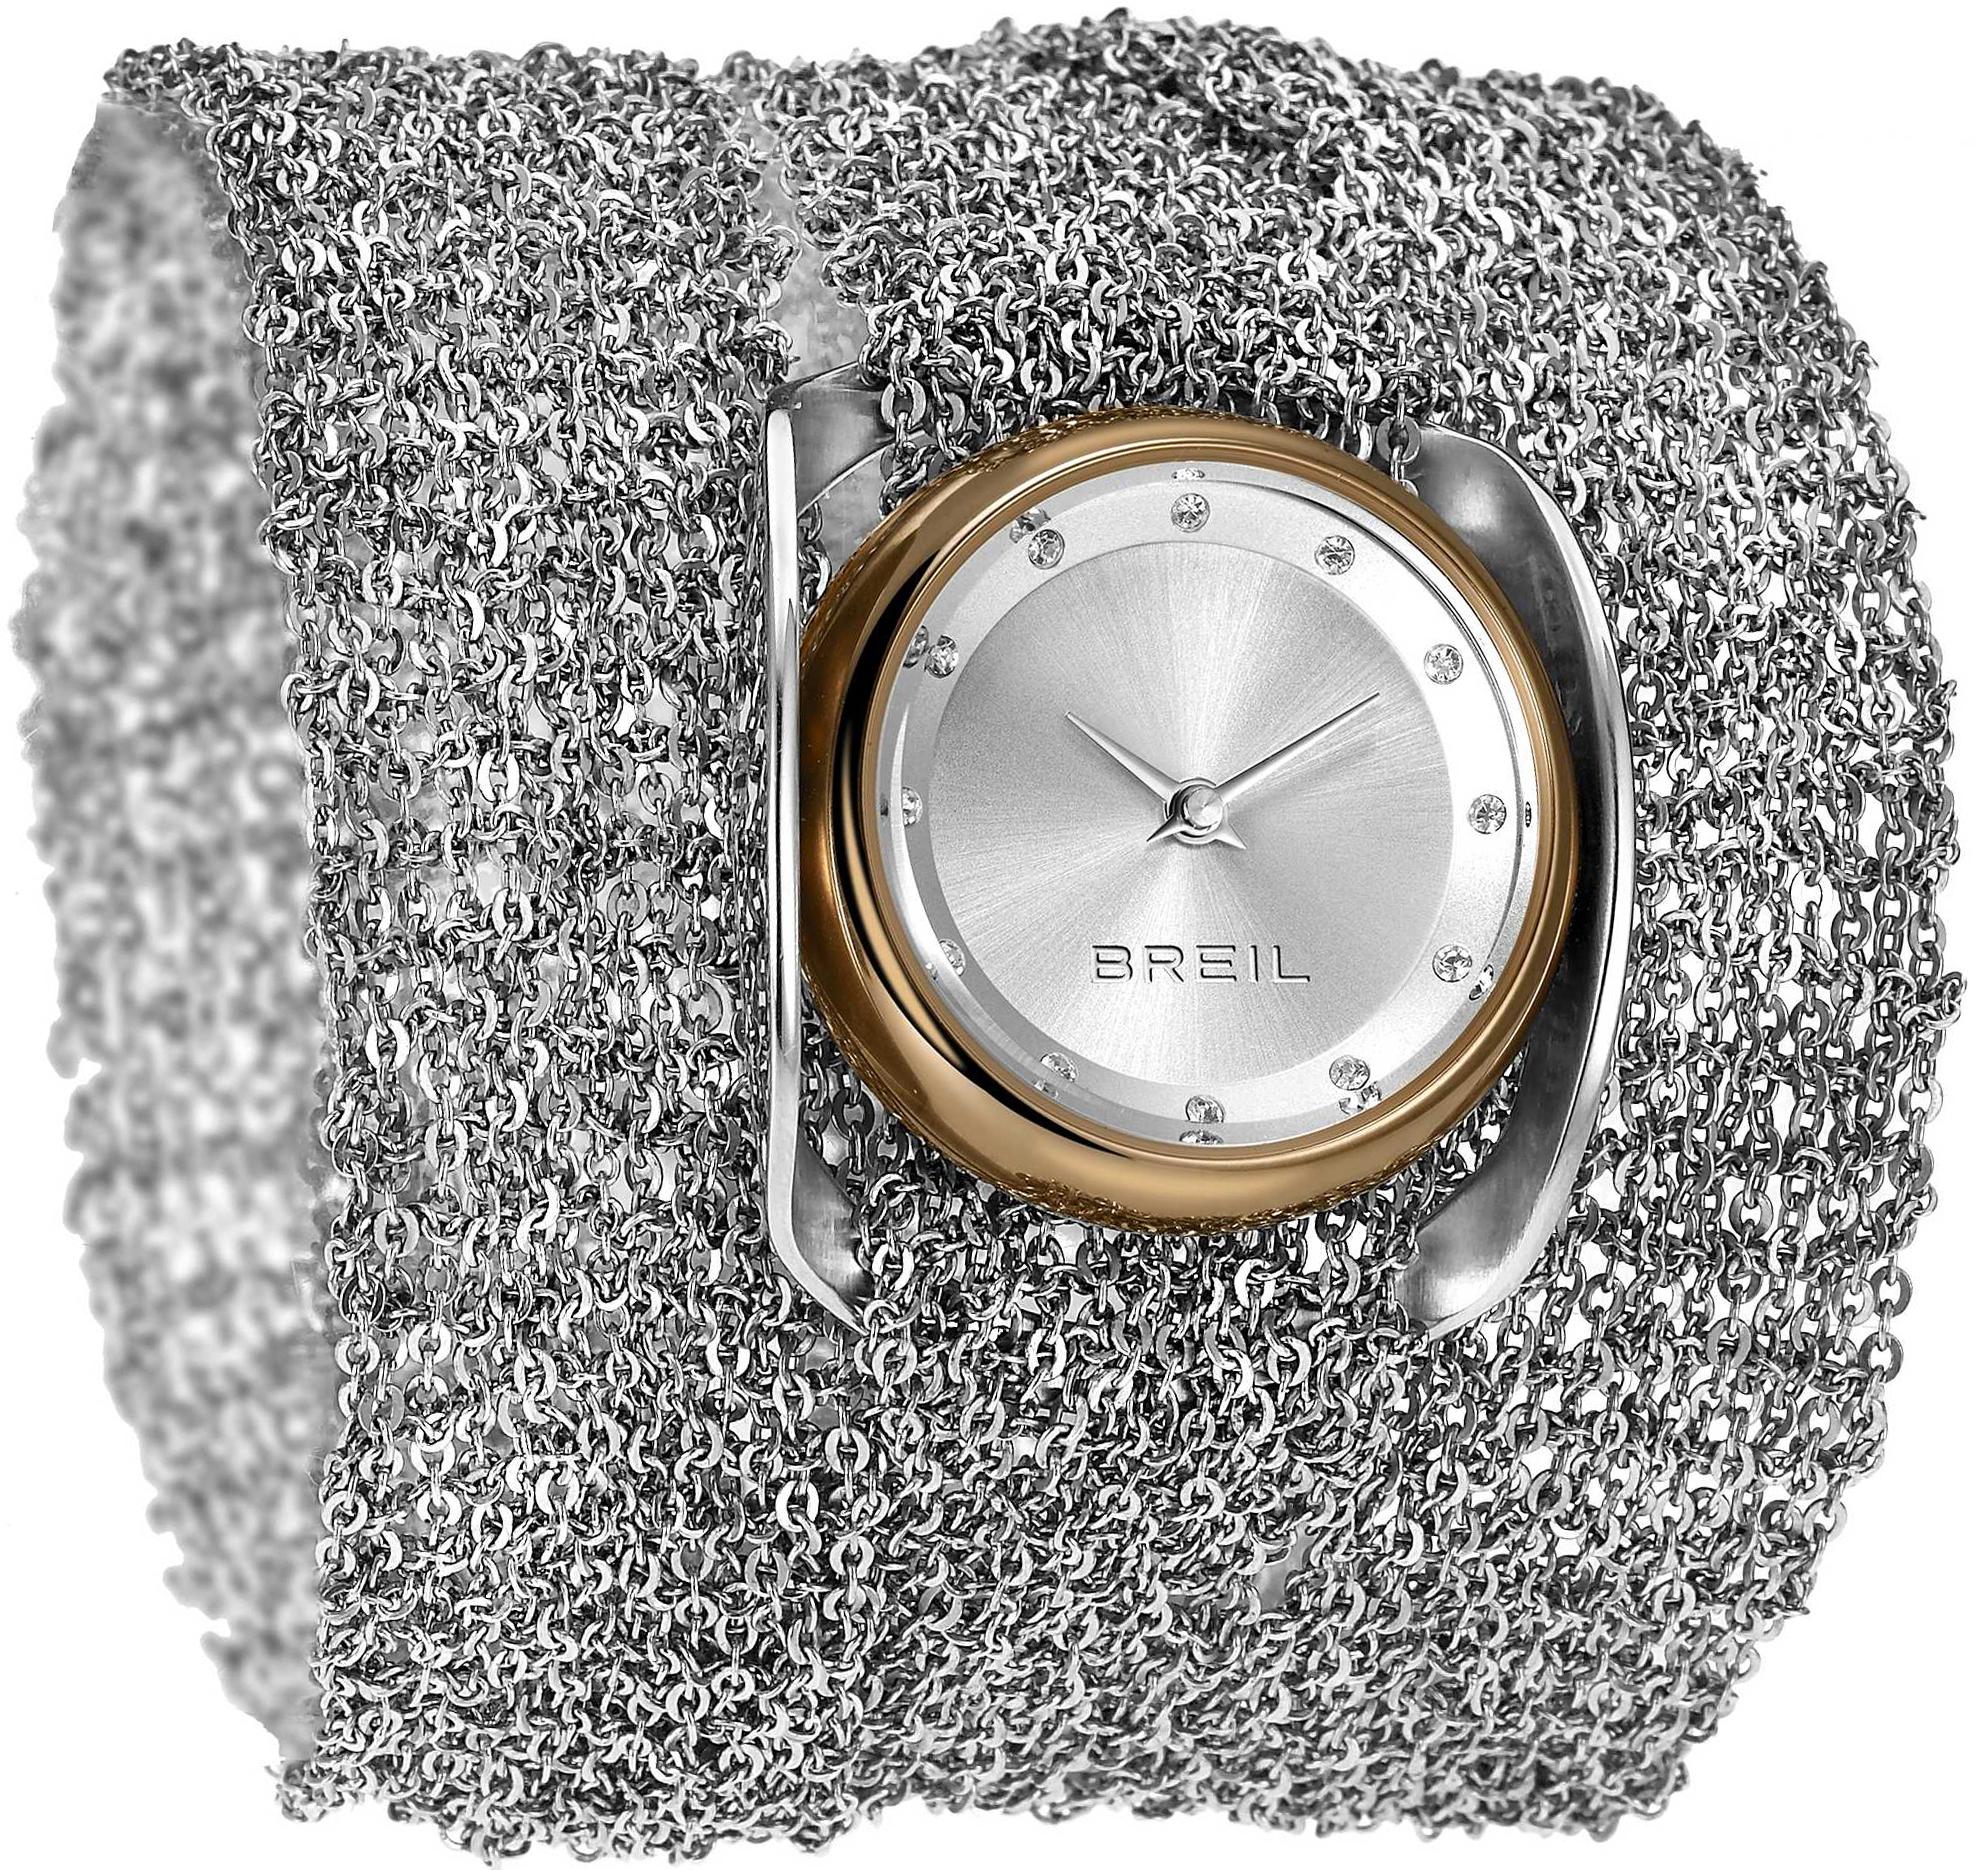 Breil Infinity Dameklokke TW1239 Sølvfarget Ø31 mm - Breil